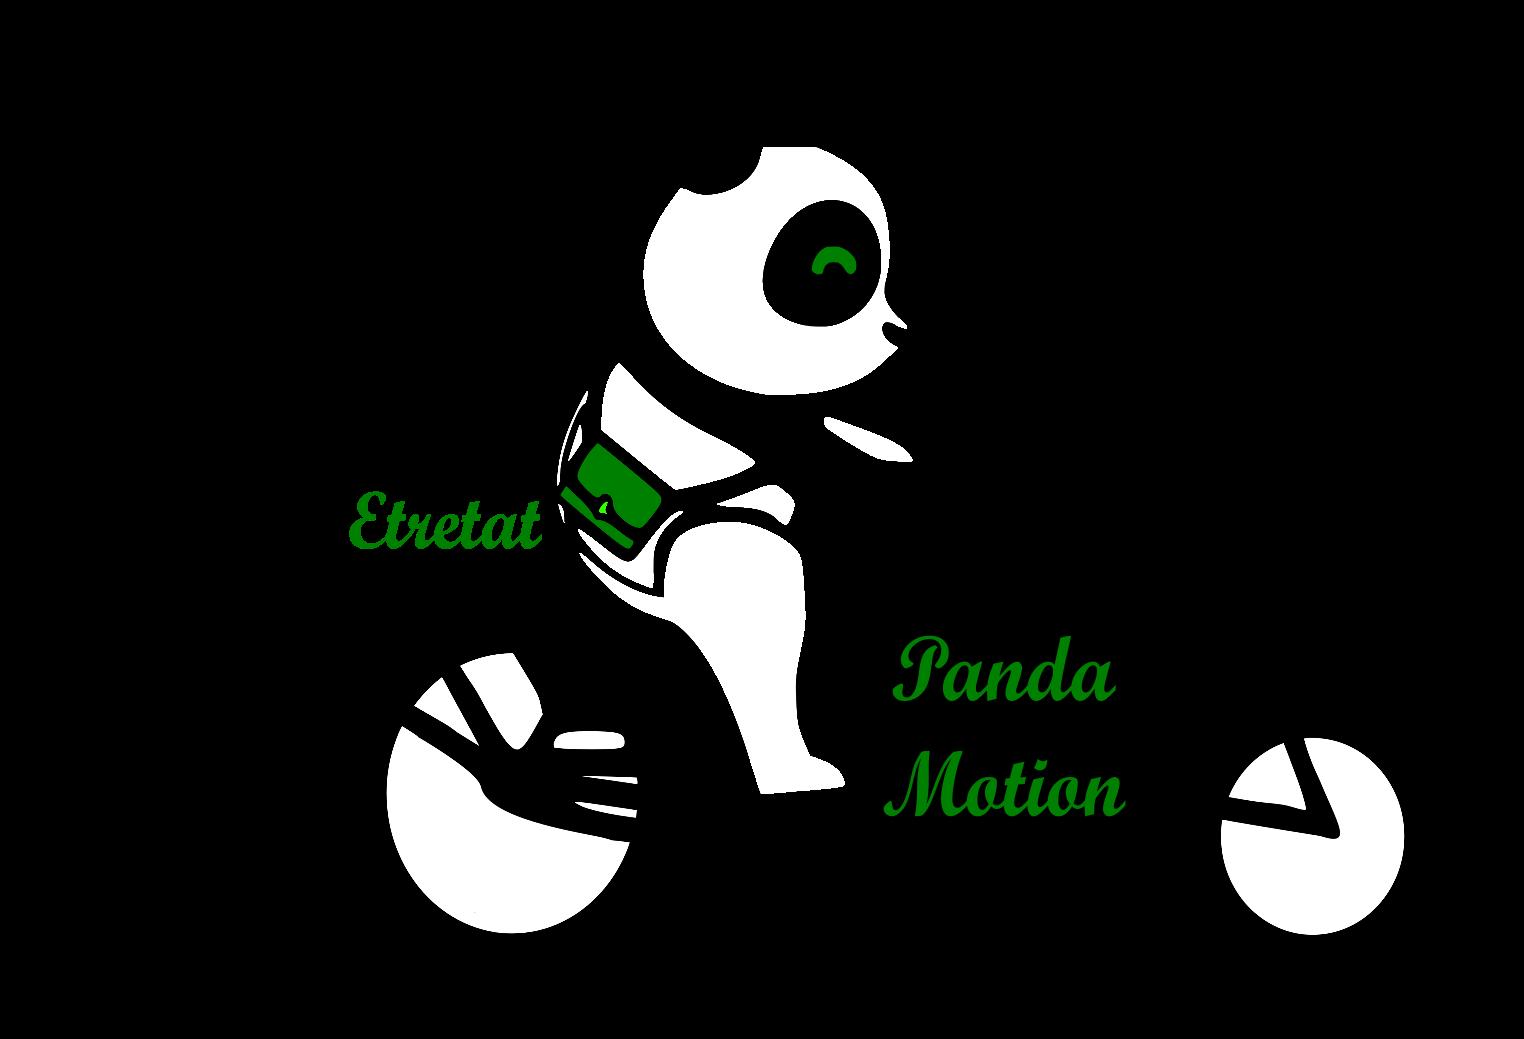 Panda Motion